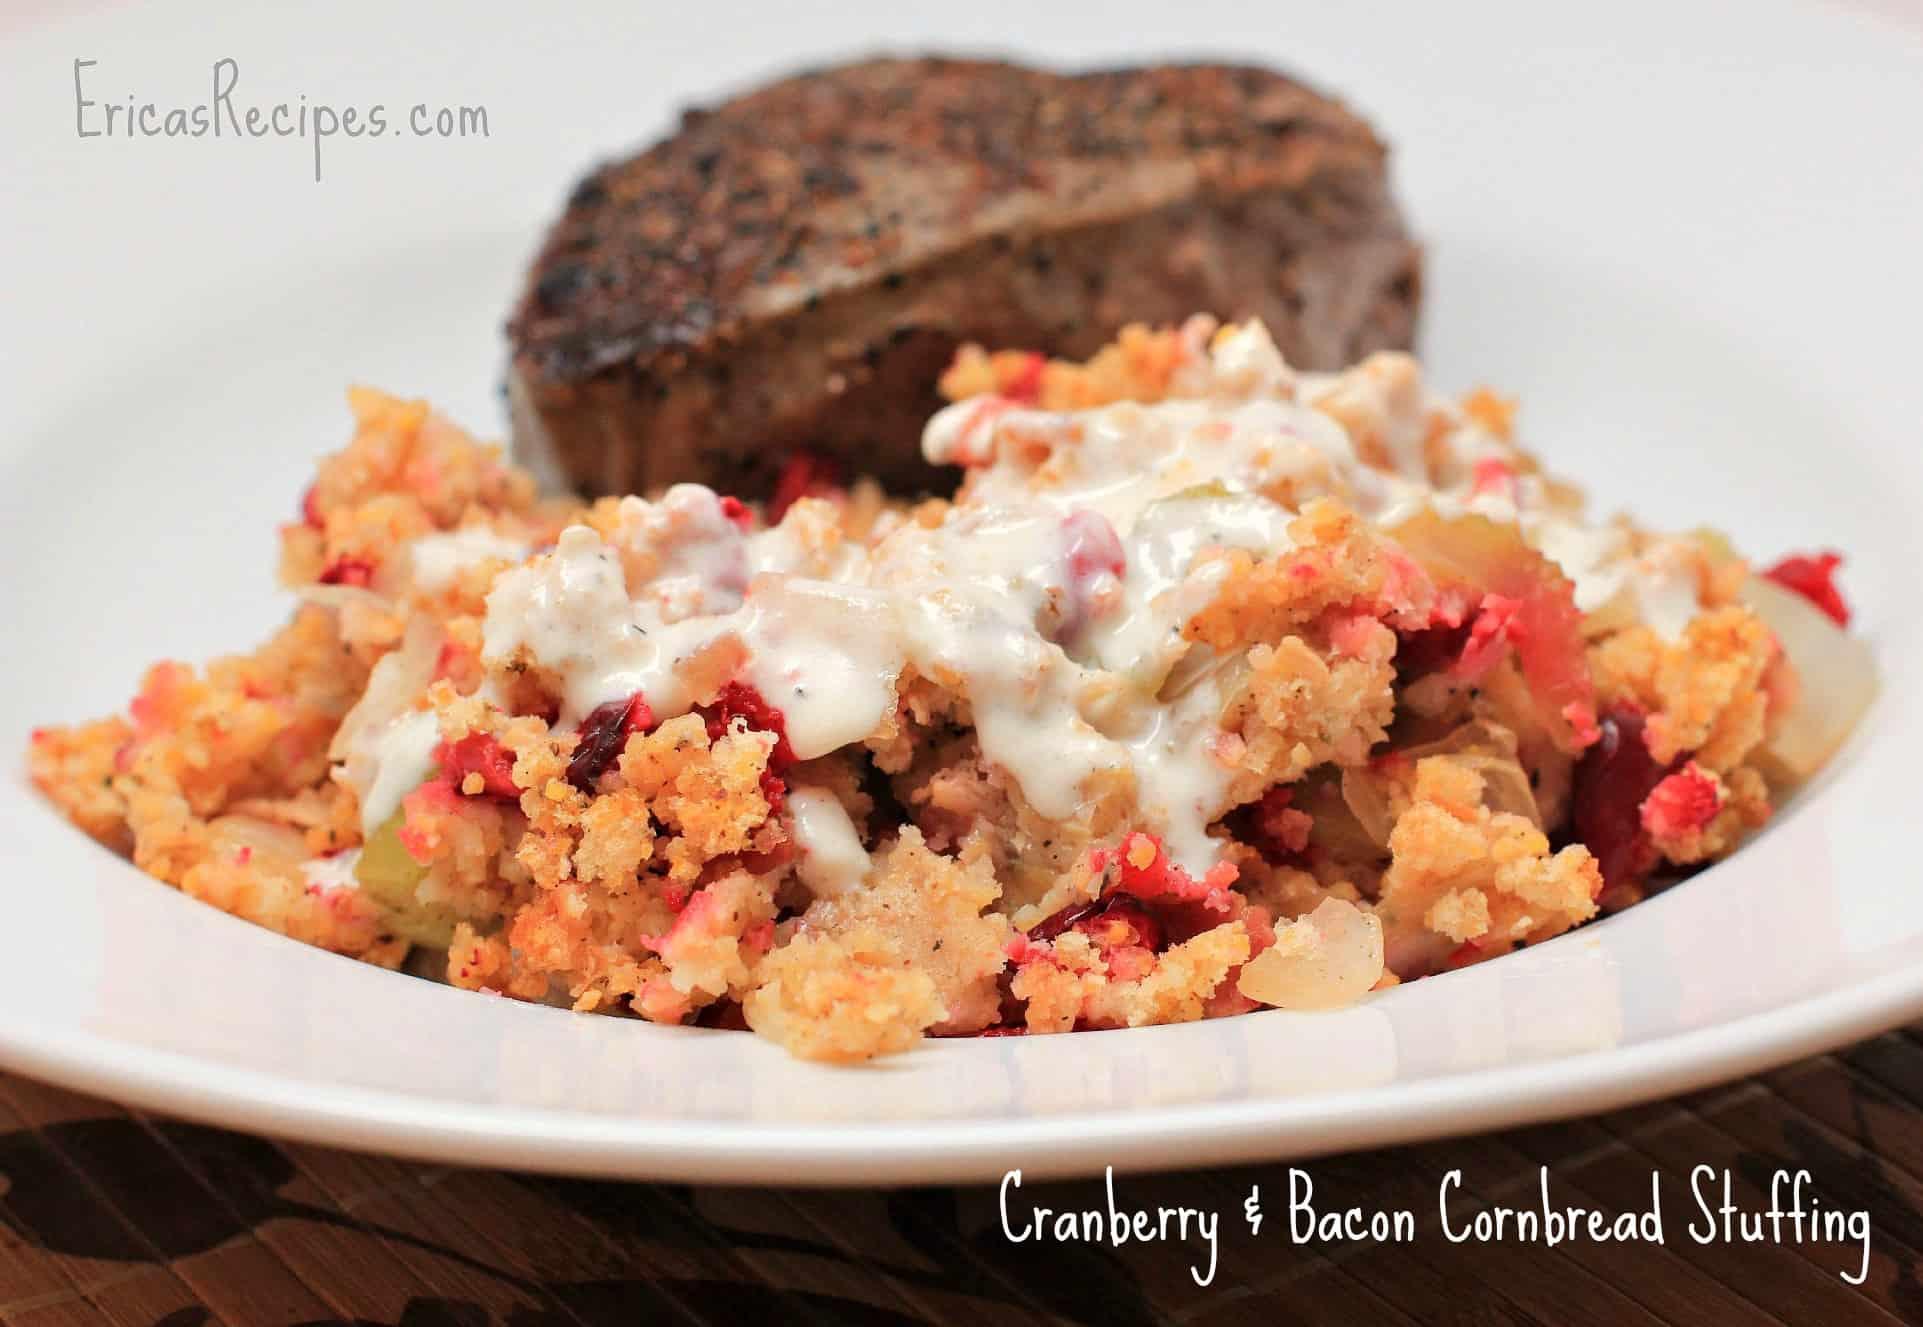 Cranberry & Bacon Cornbread Stuffing